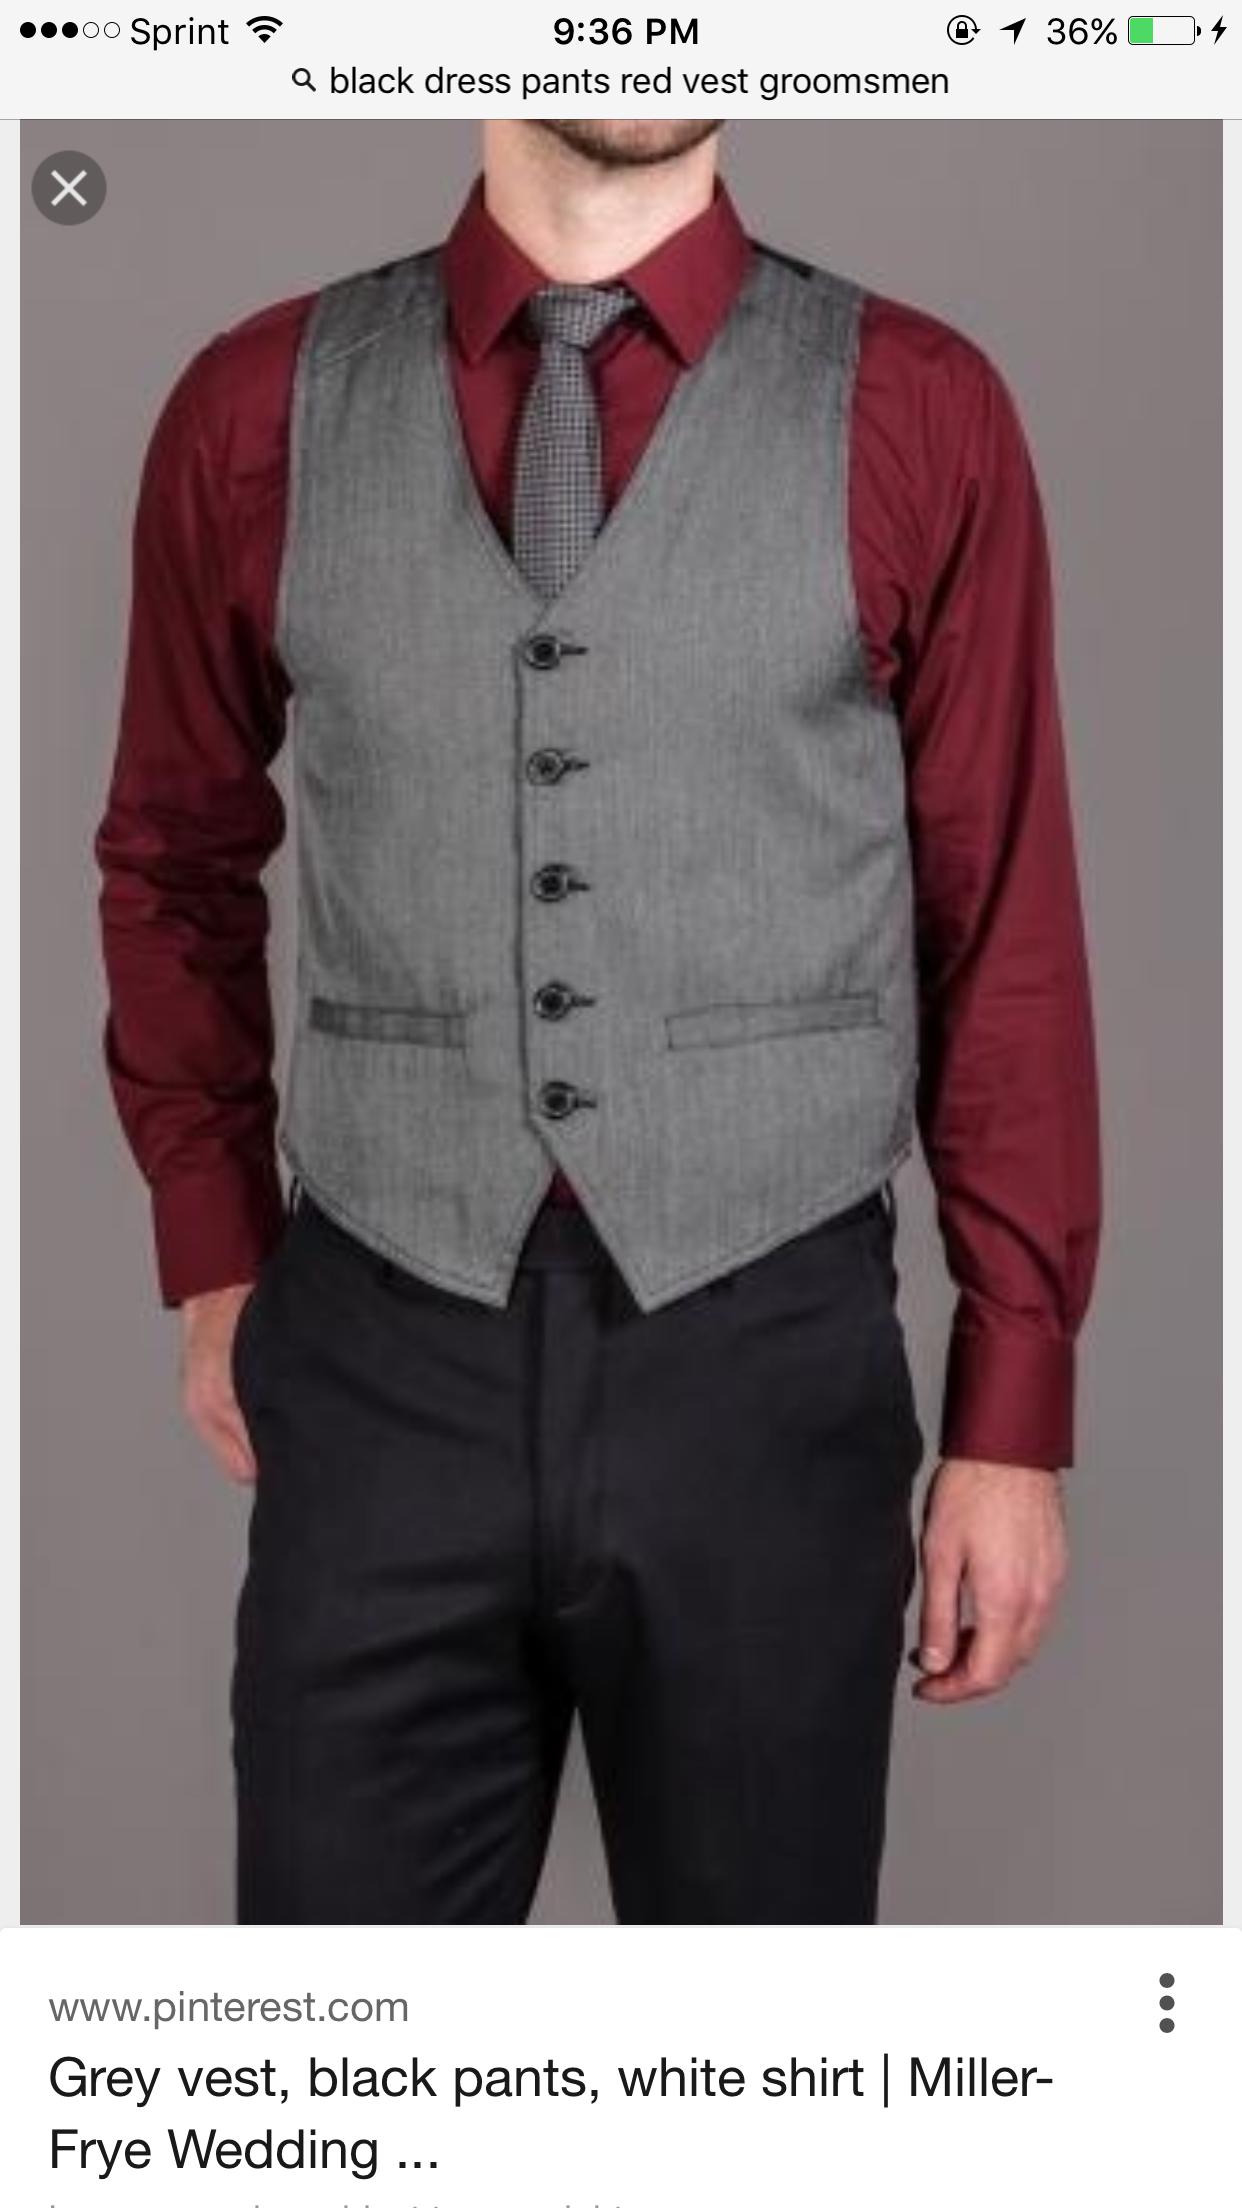 Pin By Kelsi Dirham On Wedding Grey Pants Men Cool Suits Business Dress Code [ 2208 x 1242 Pixel ]